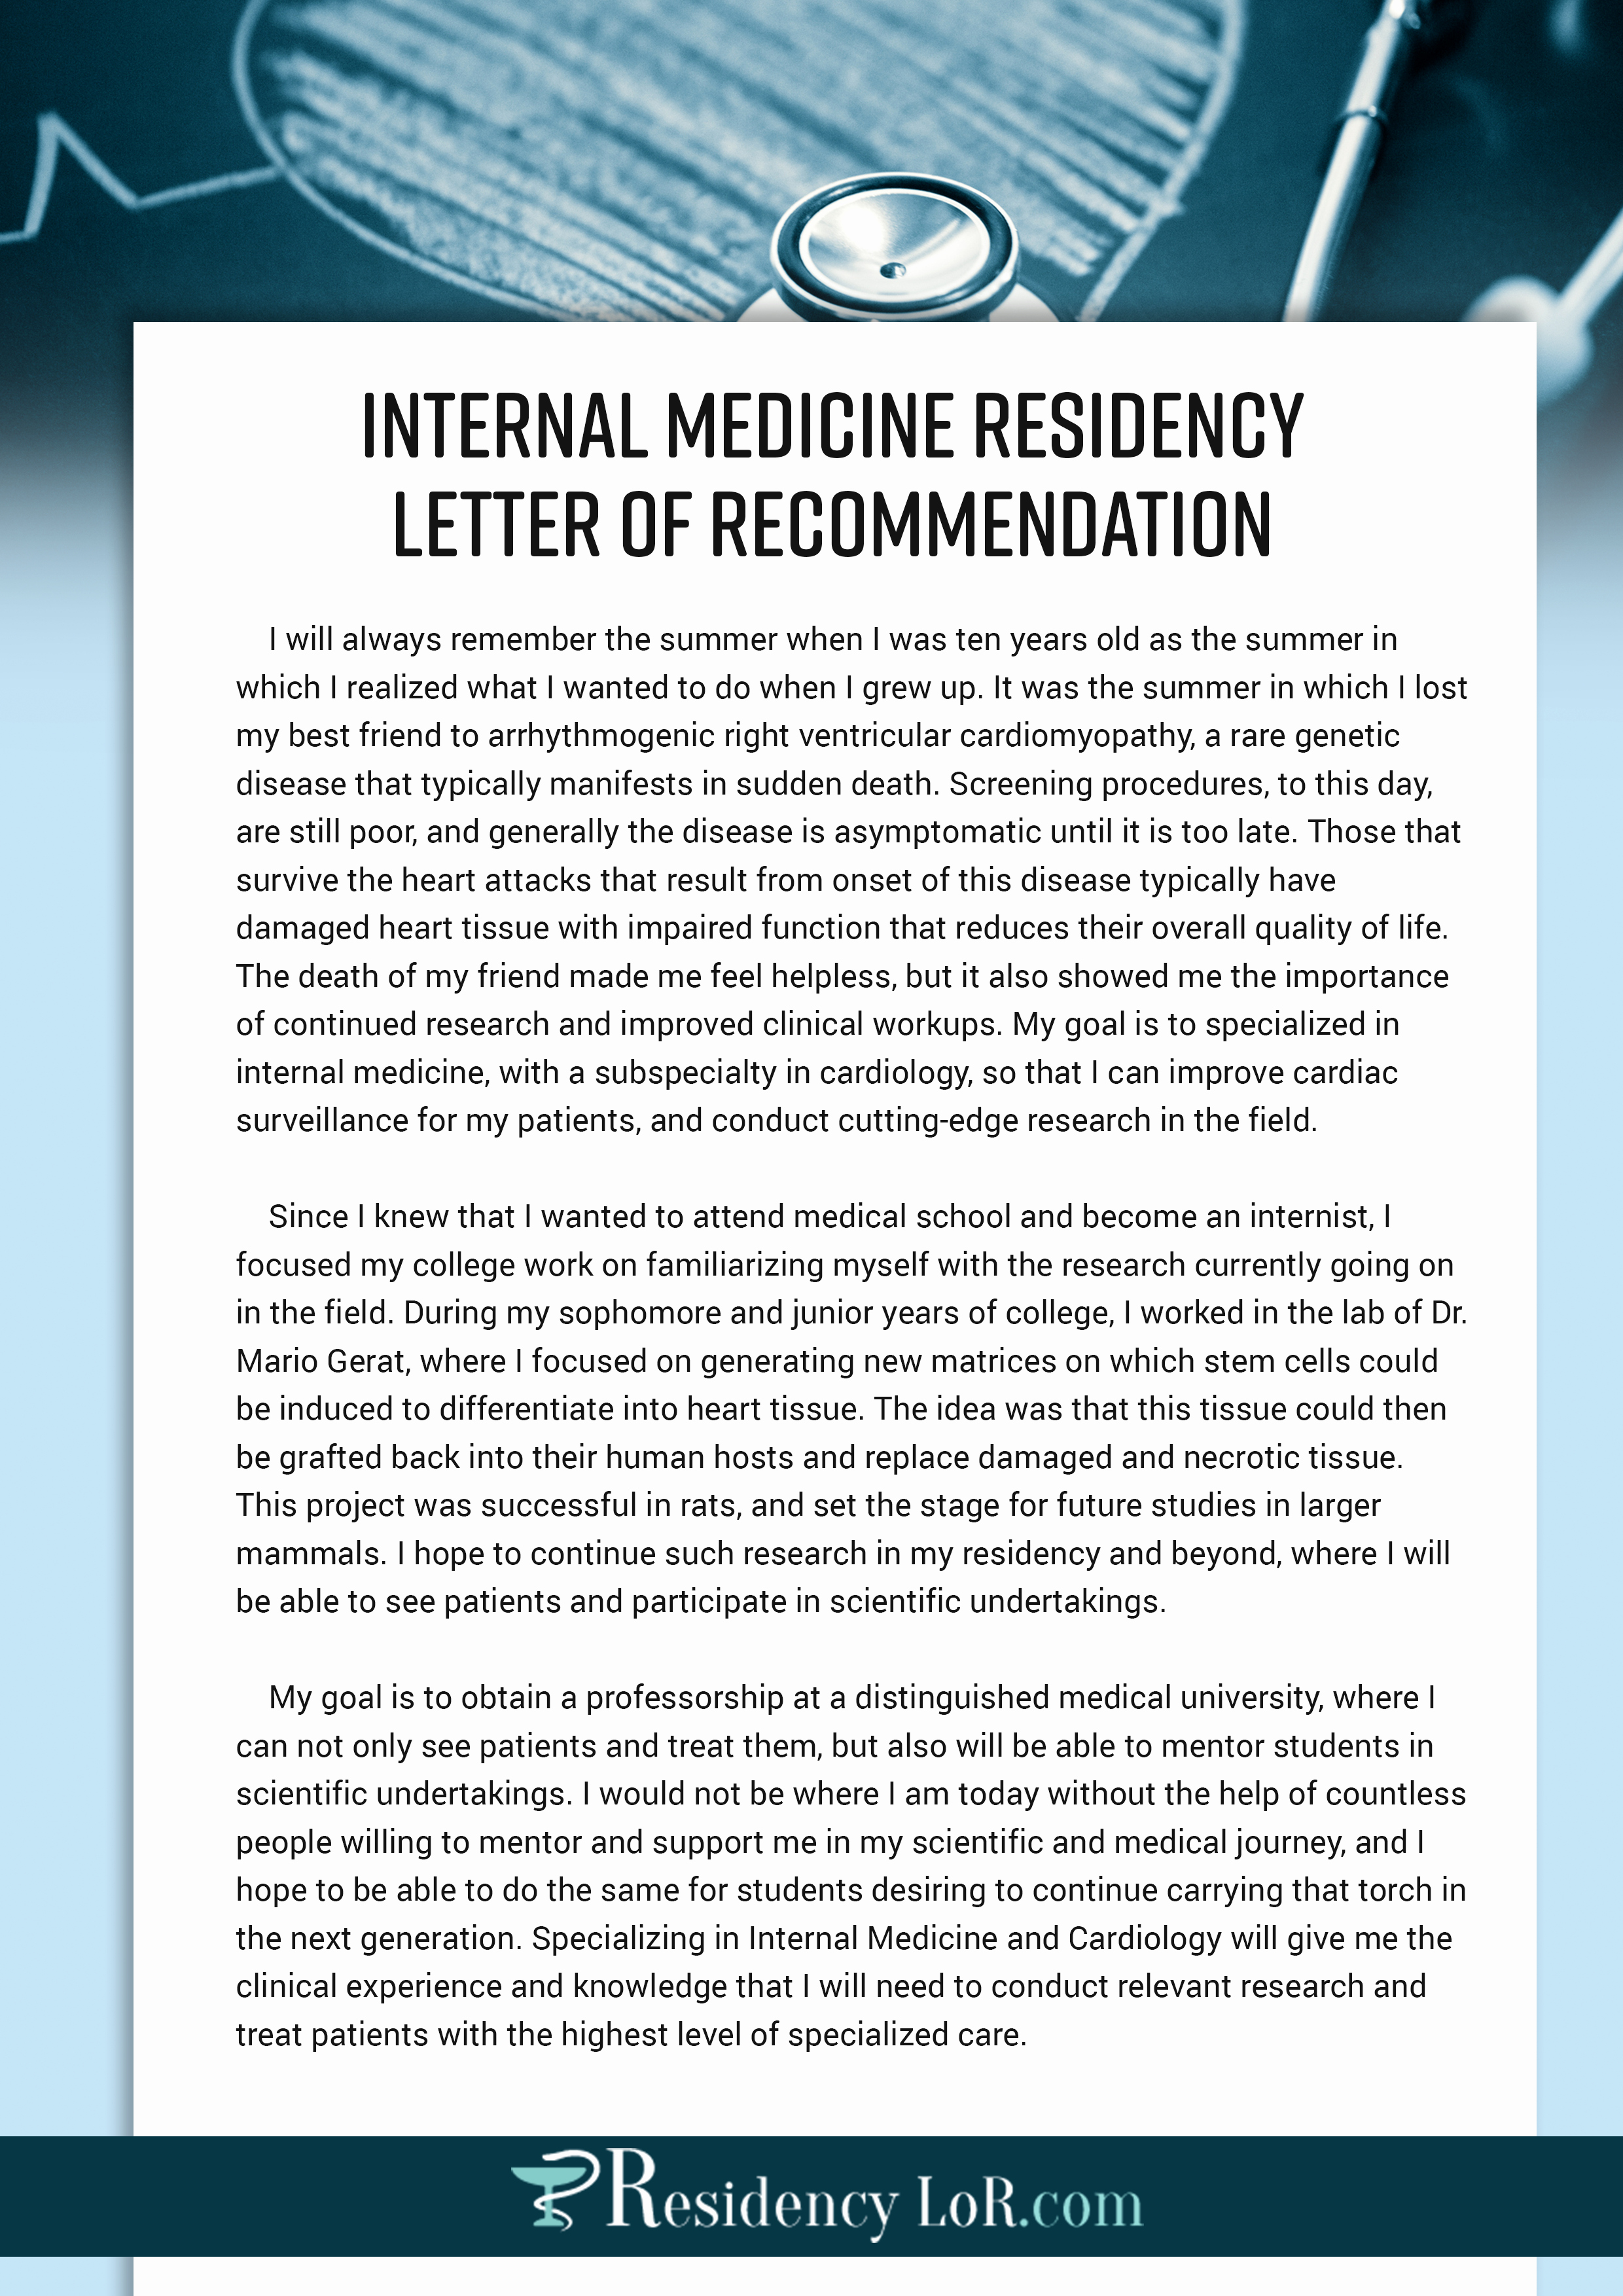 Residency Recommendation Letter Sample Luxury Sample Letter Of Re Mendation for Internal Medicine